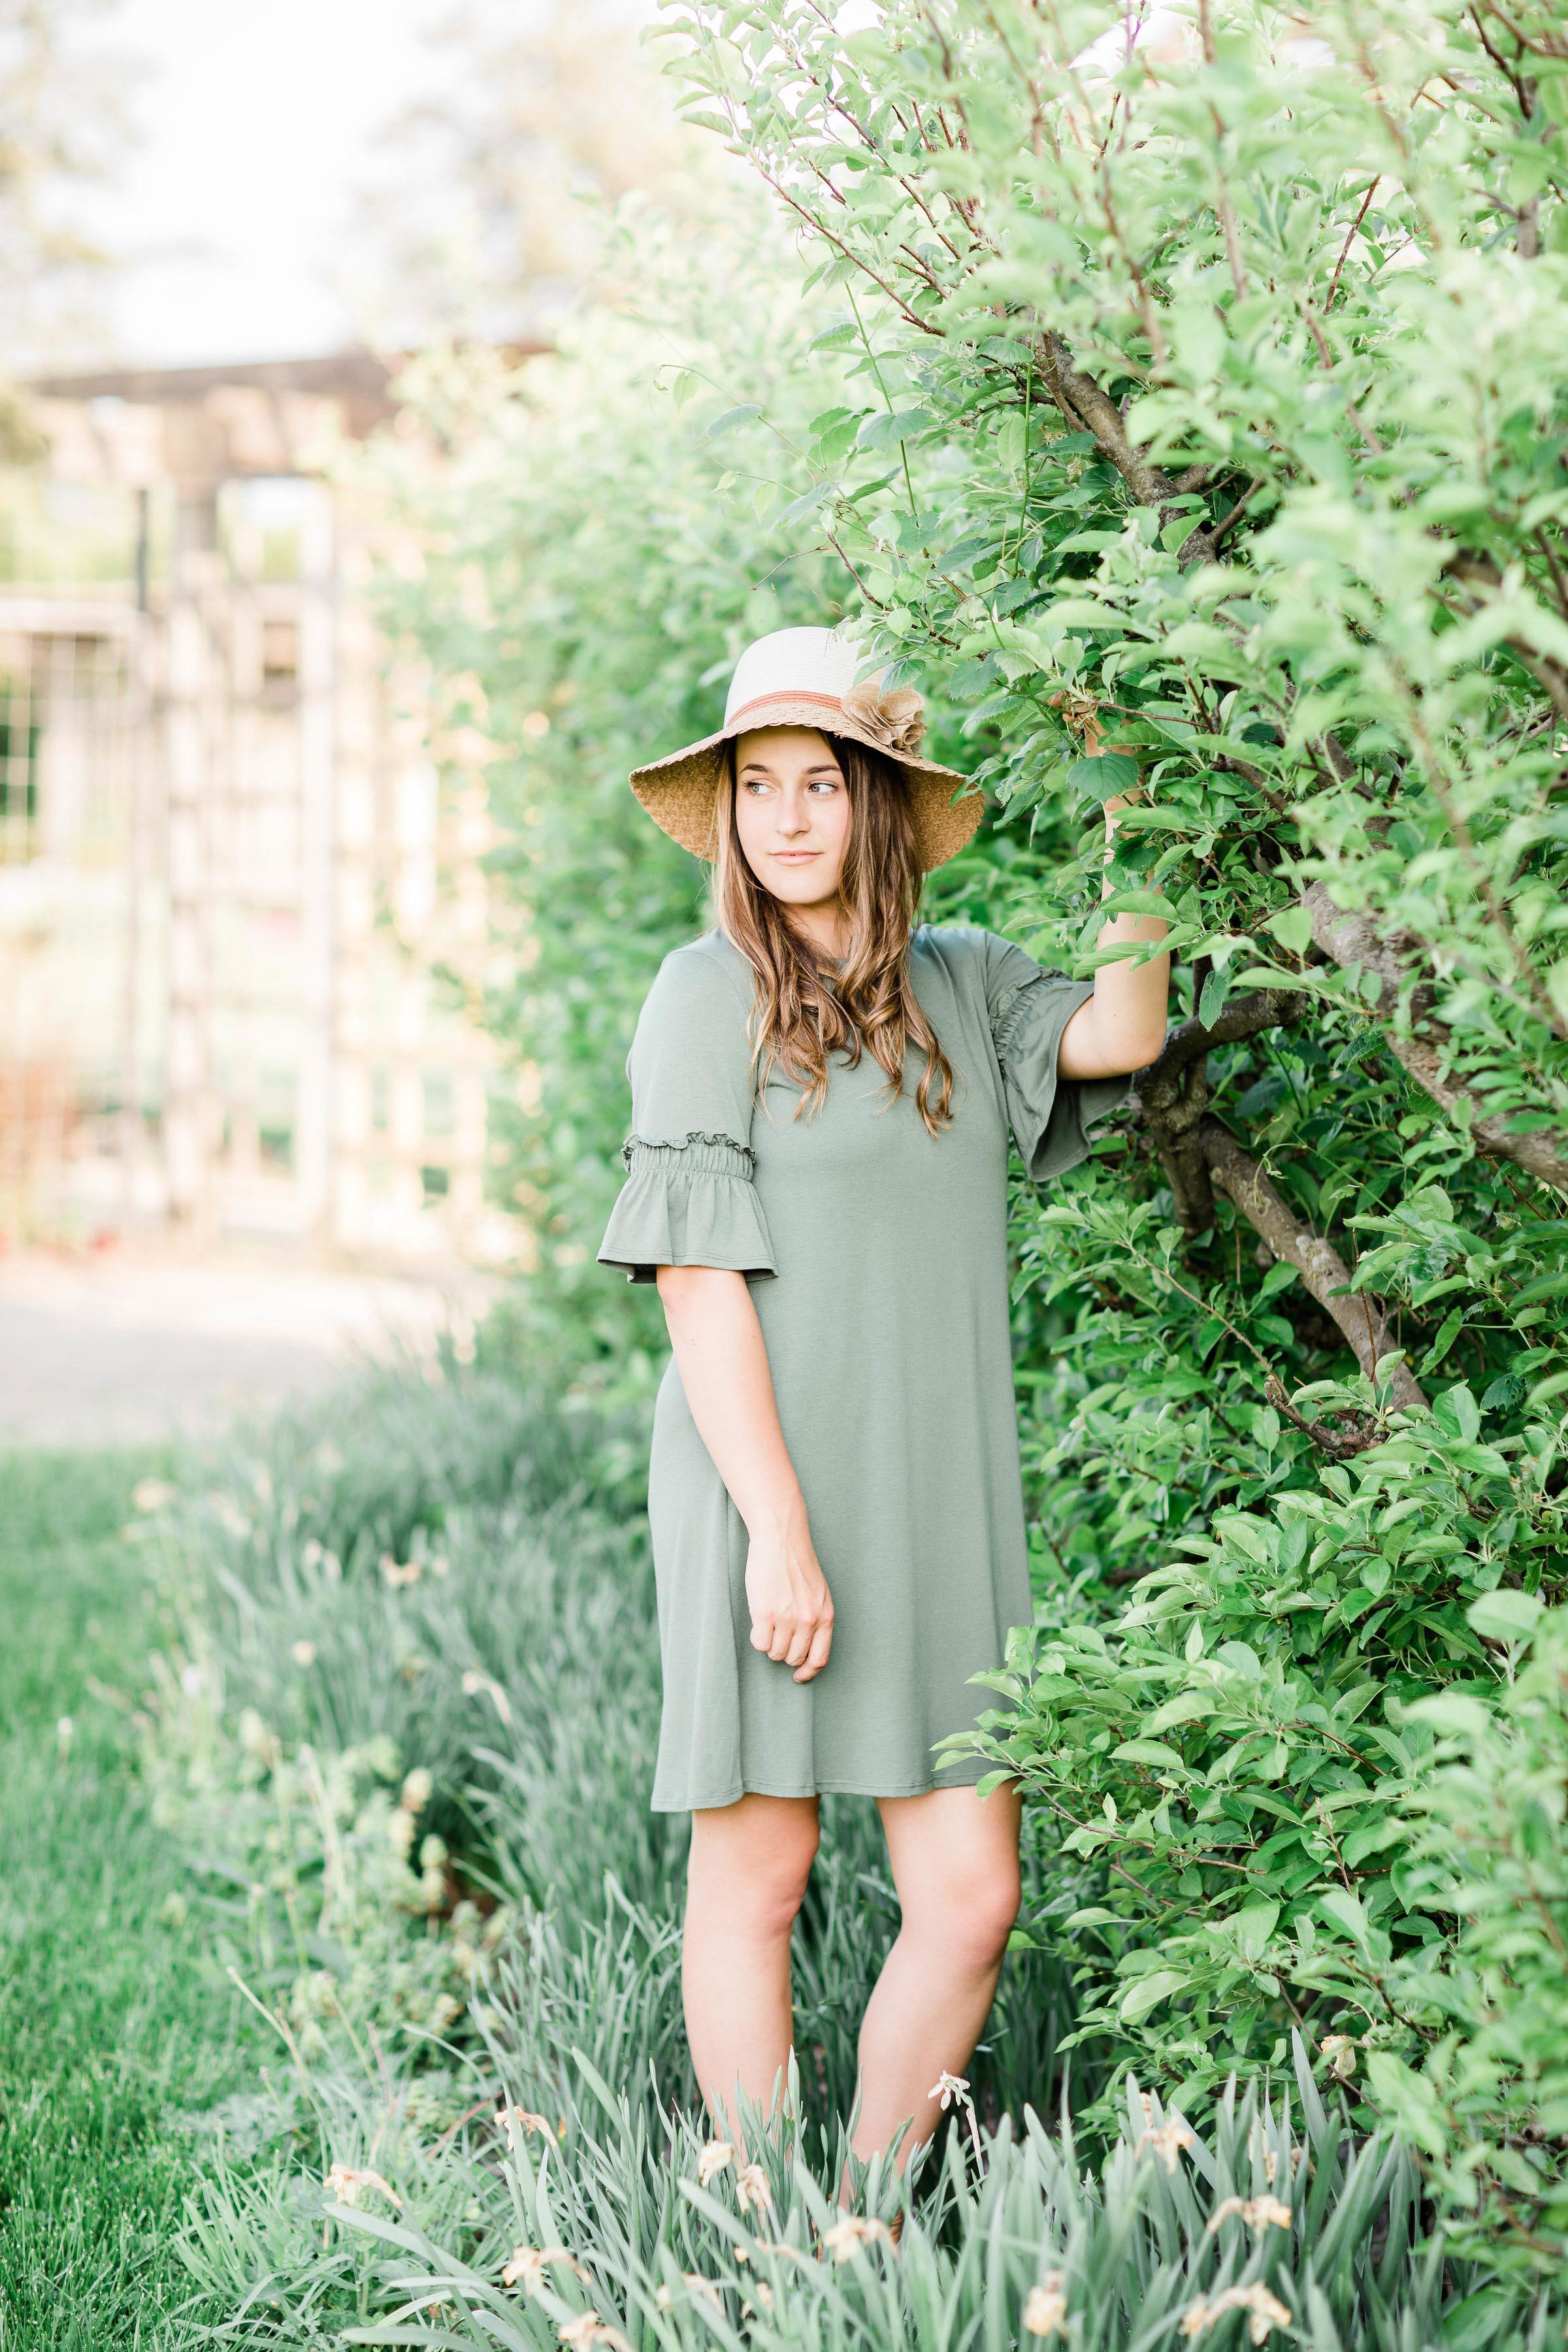 cincinnati dayton senior photographer cox arboretum session lauren day photography-6.jpg